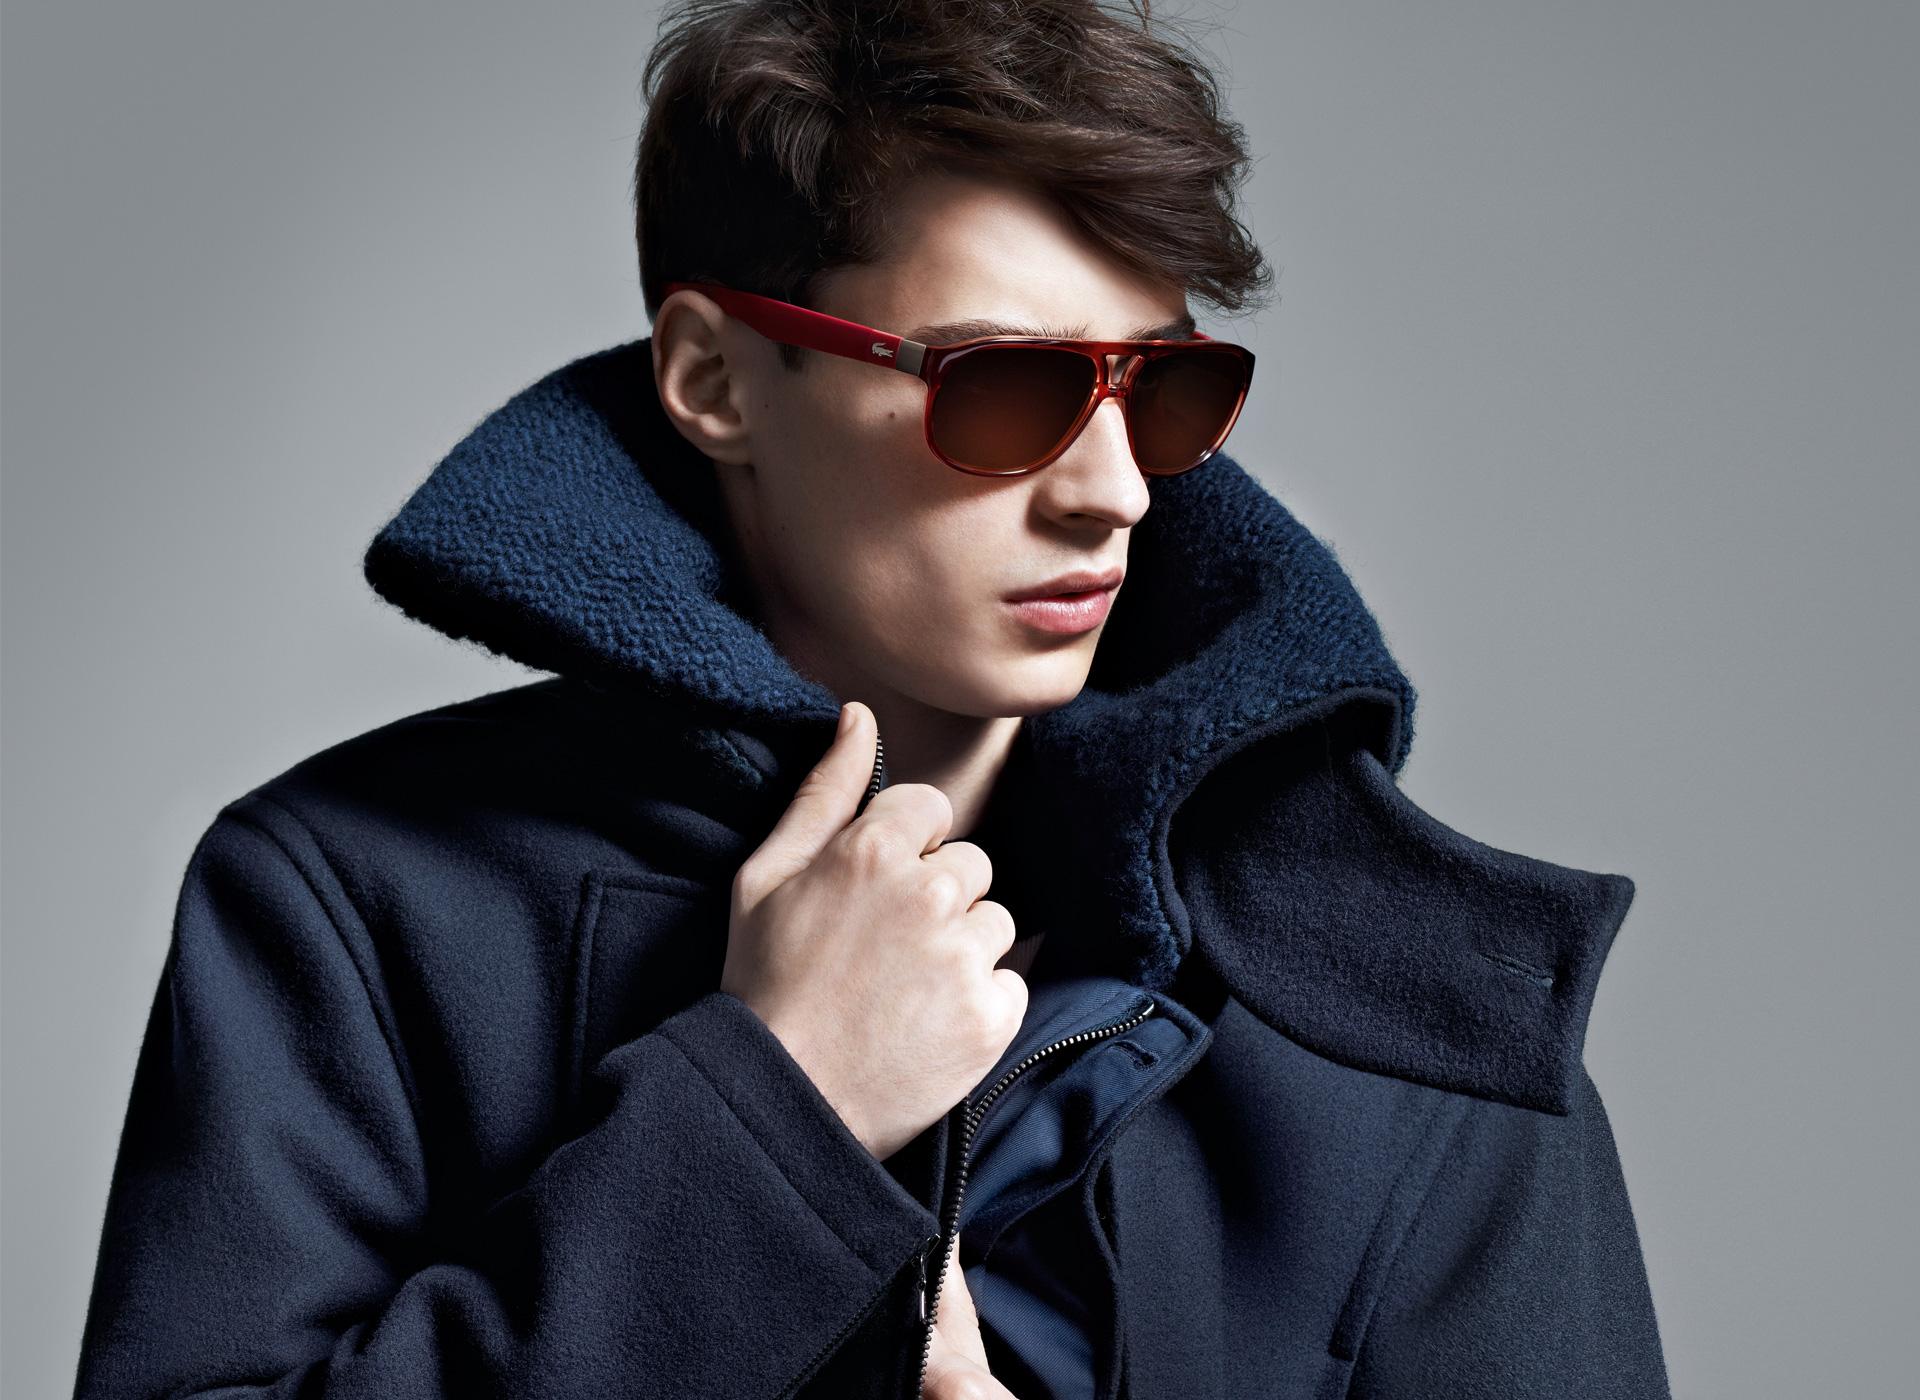 Adrien Saholres for Lacoste Eyewear